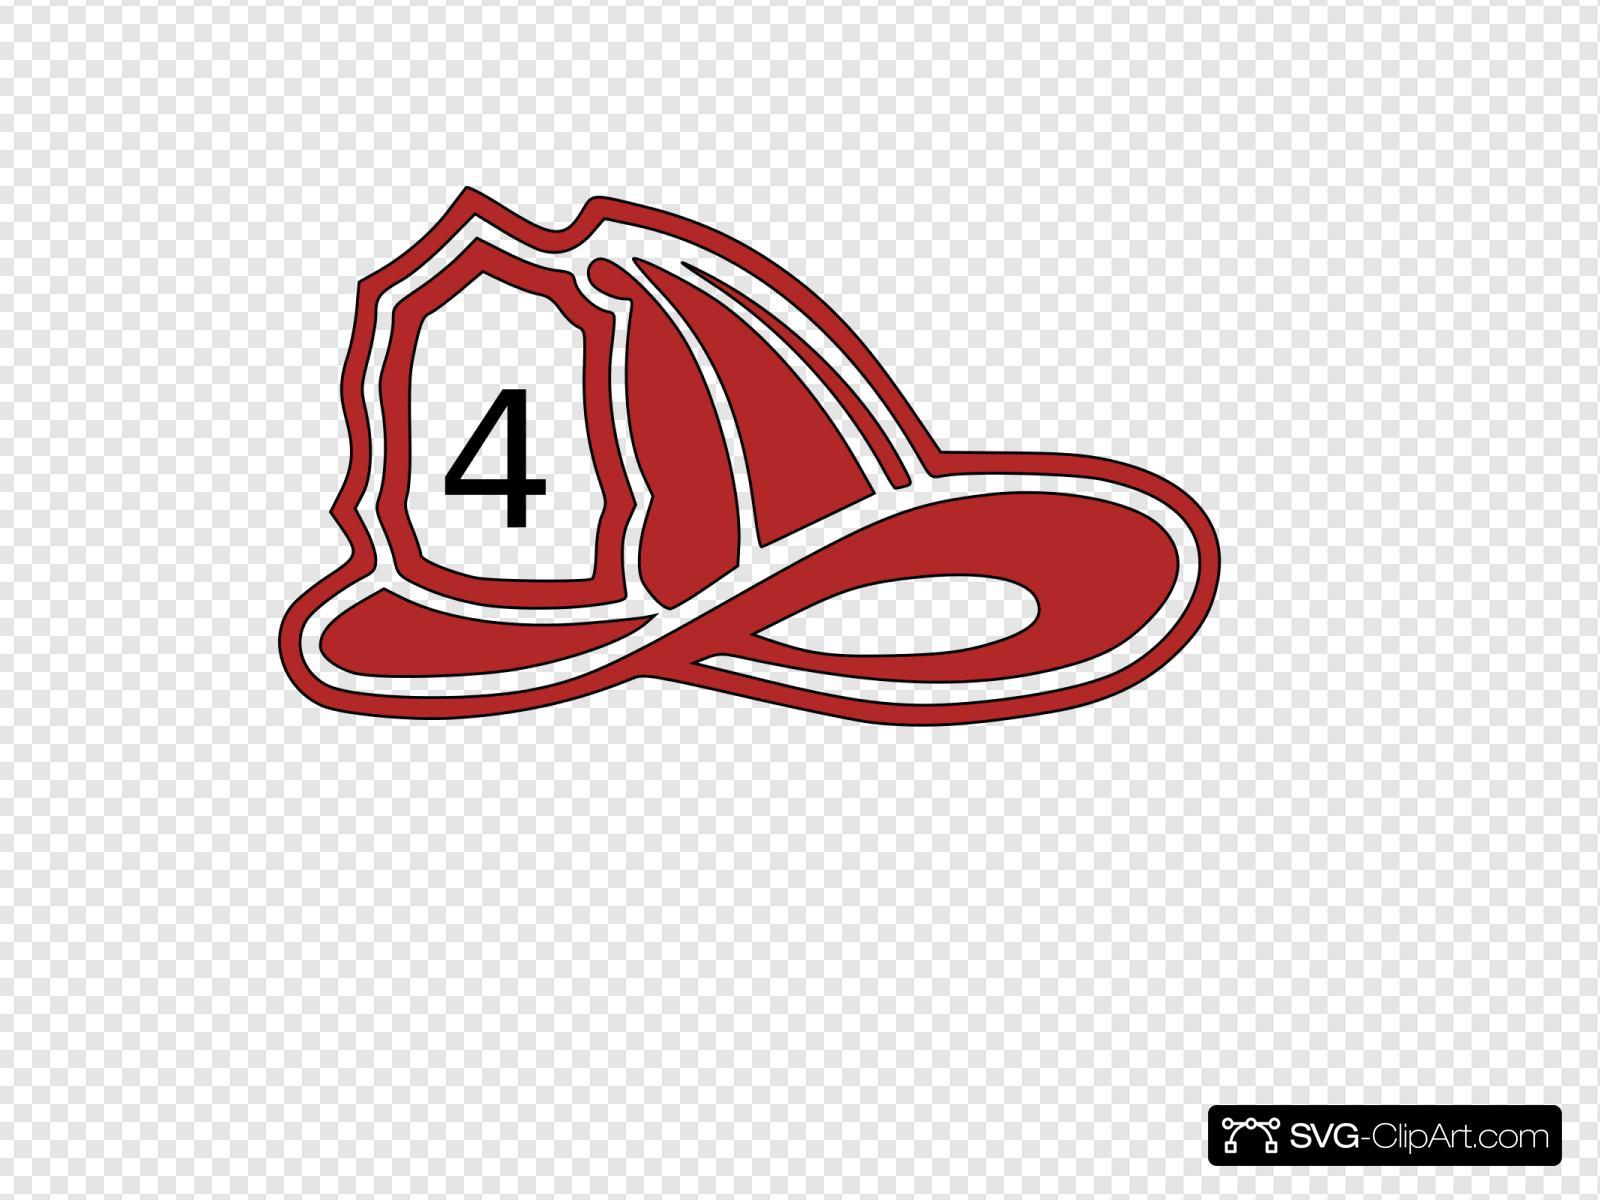 Red Fire Truck Hat 4 Svg Vector Red Fire Truck Hat 4 Clip Art Svg Clipart